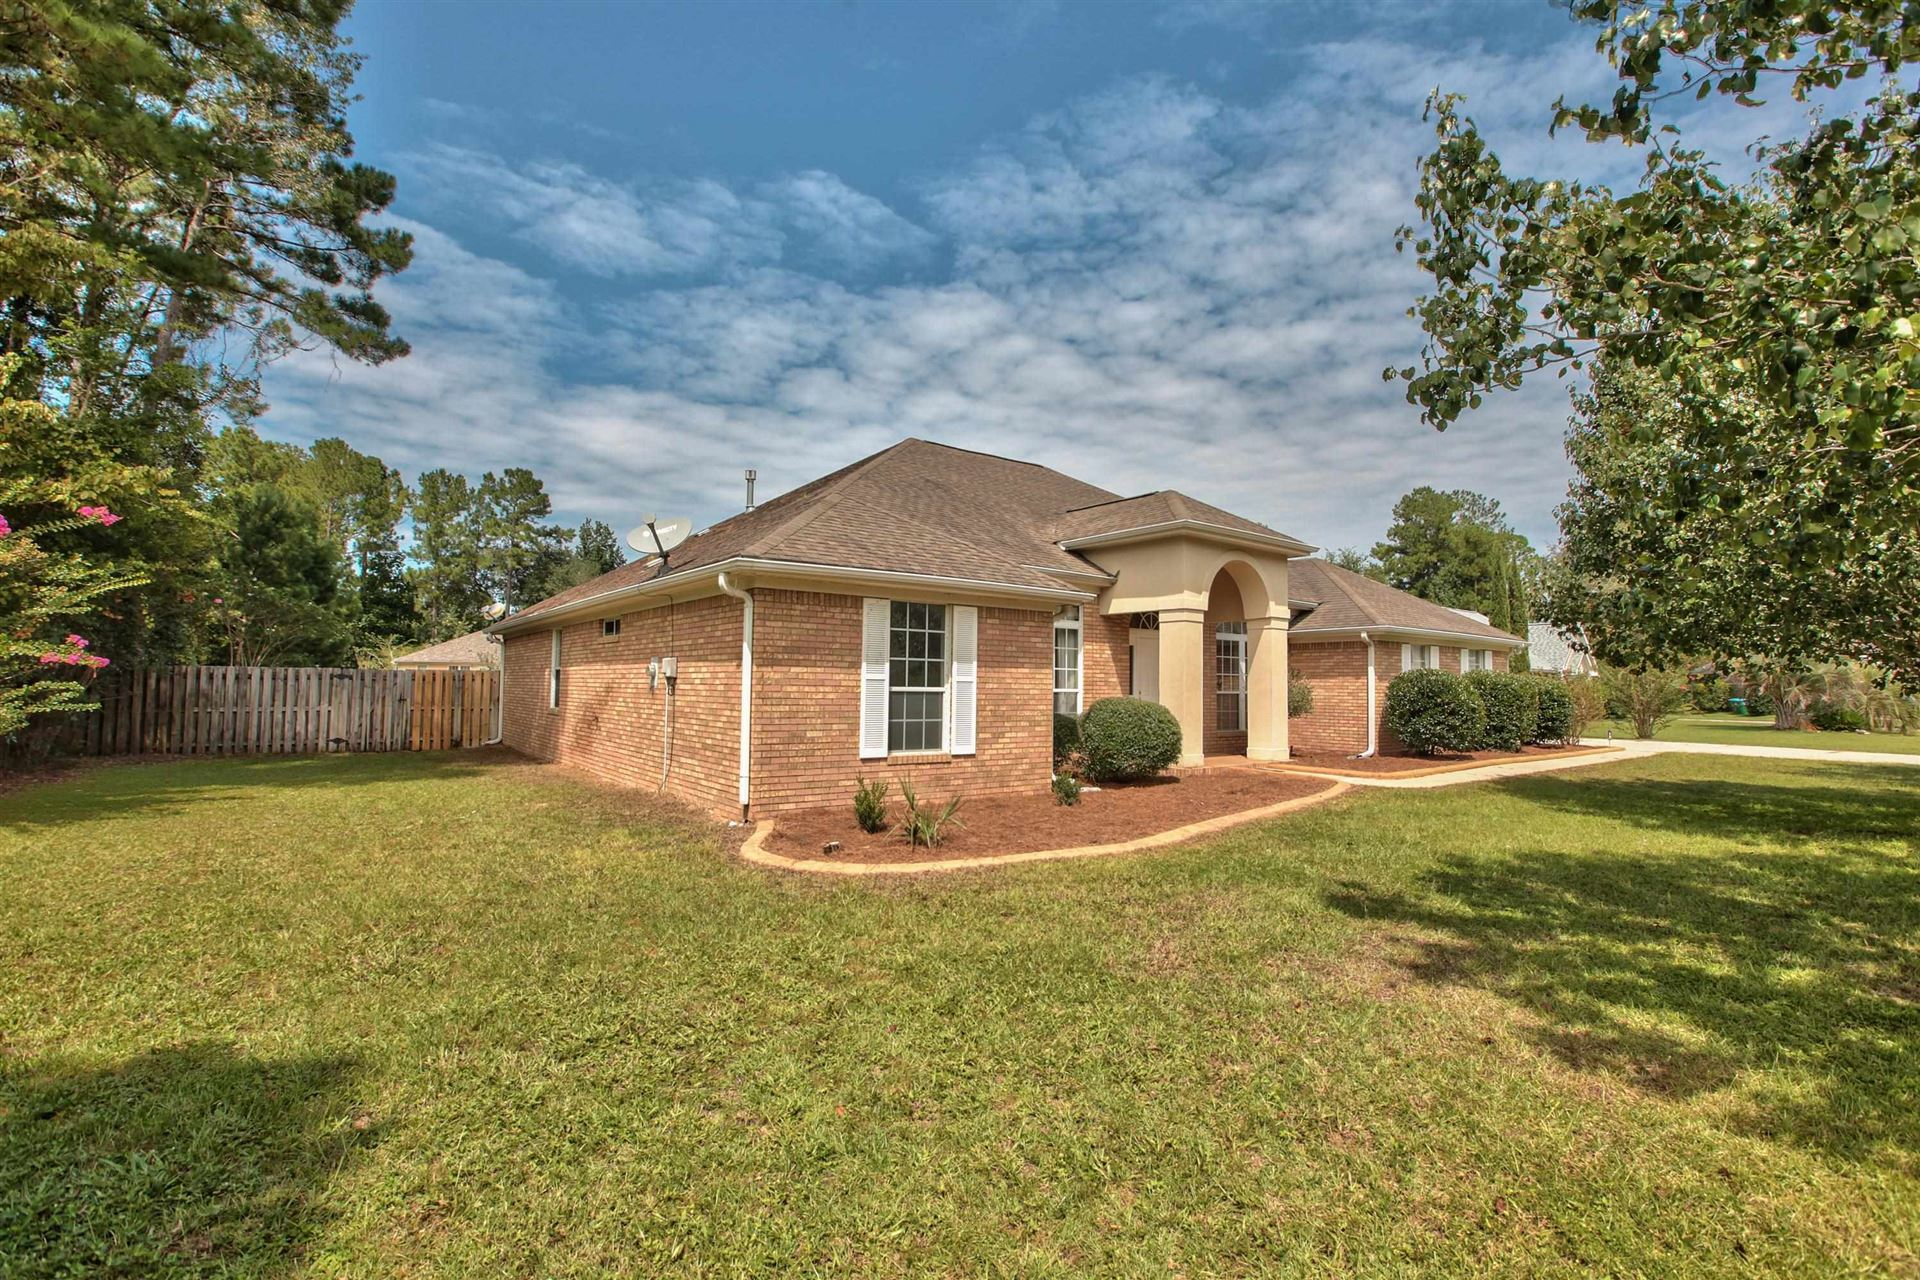 48 Cardinal Court, Crawfordville, FL 32327 - MLS#: 337400